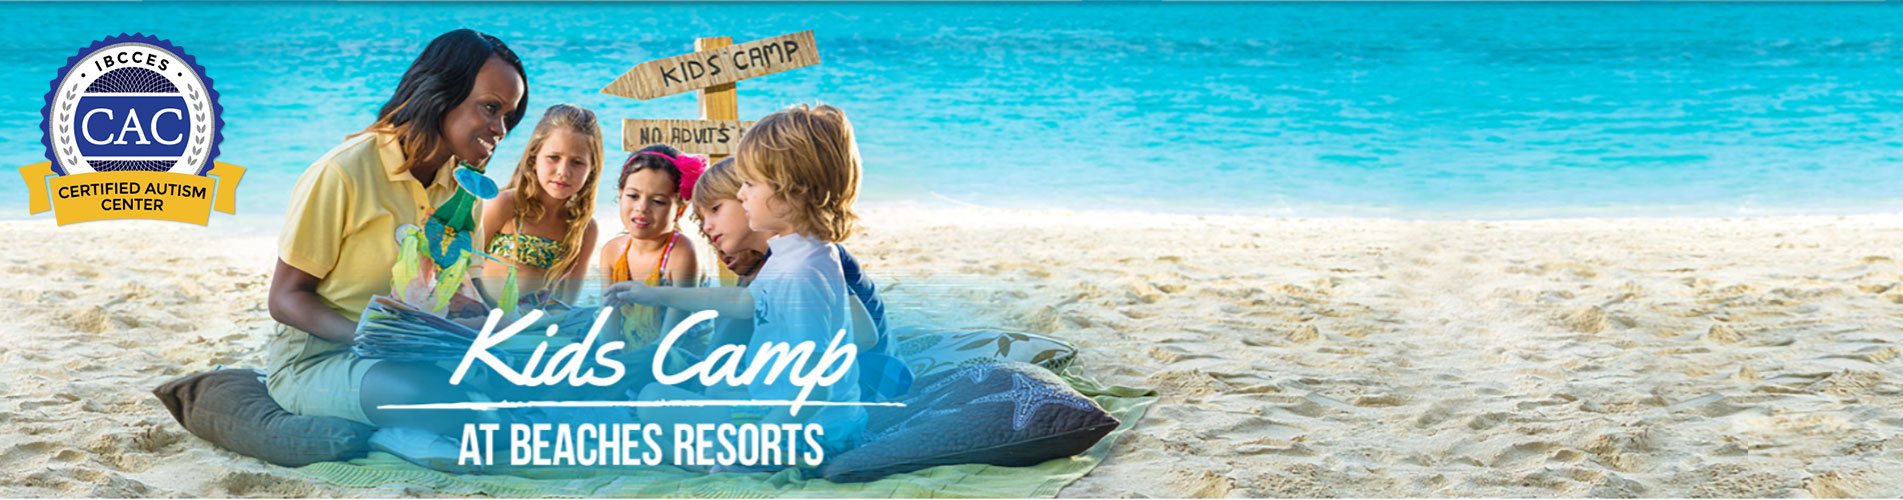 beaches resorts designated certified autism centers